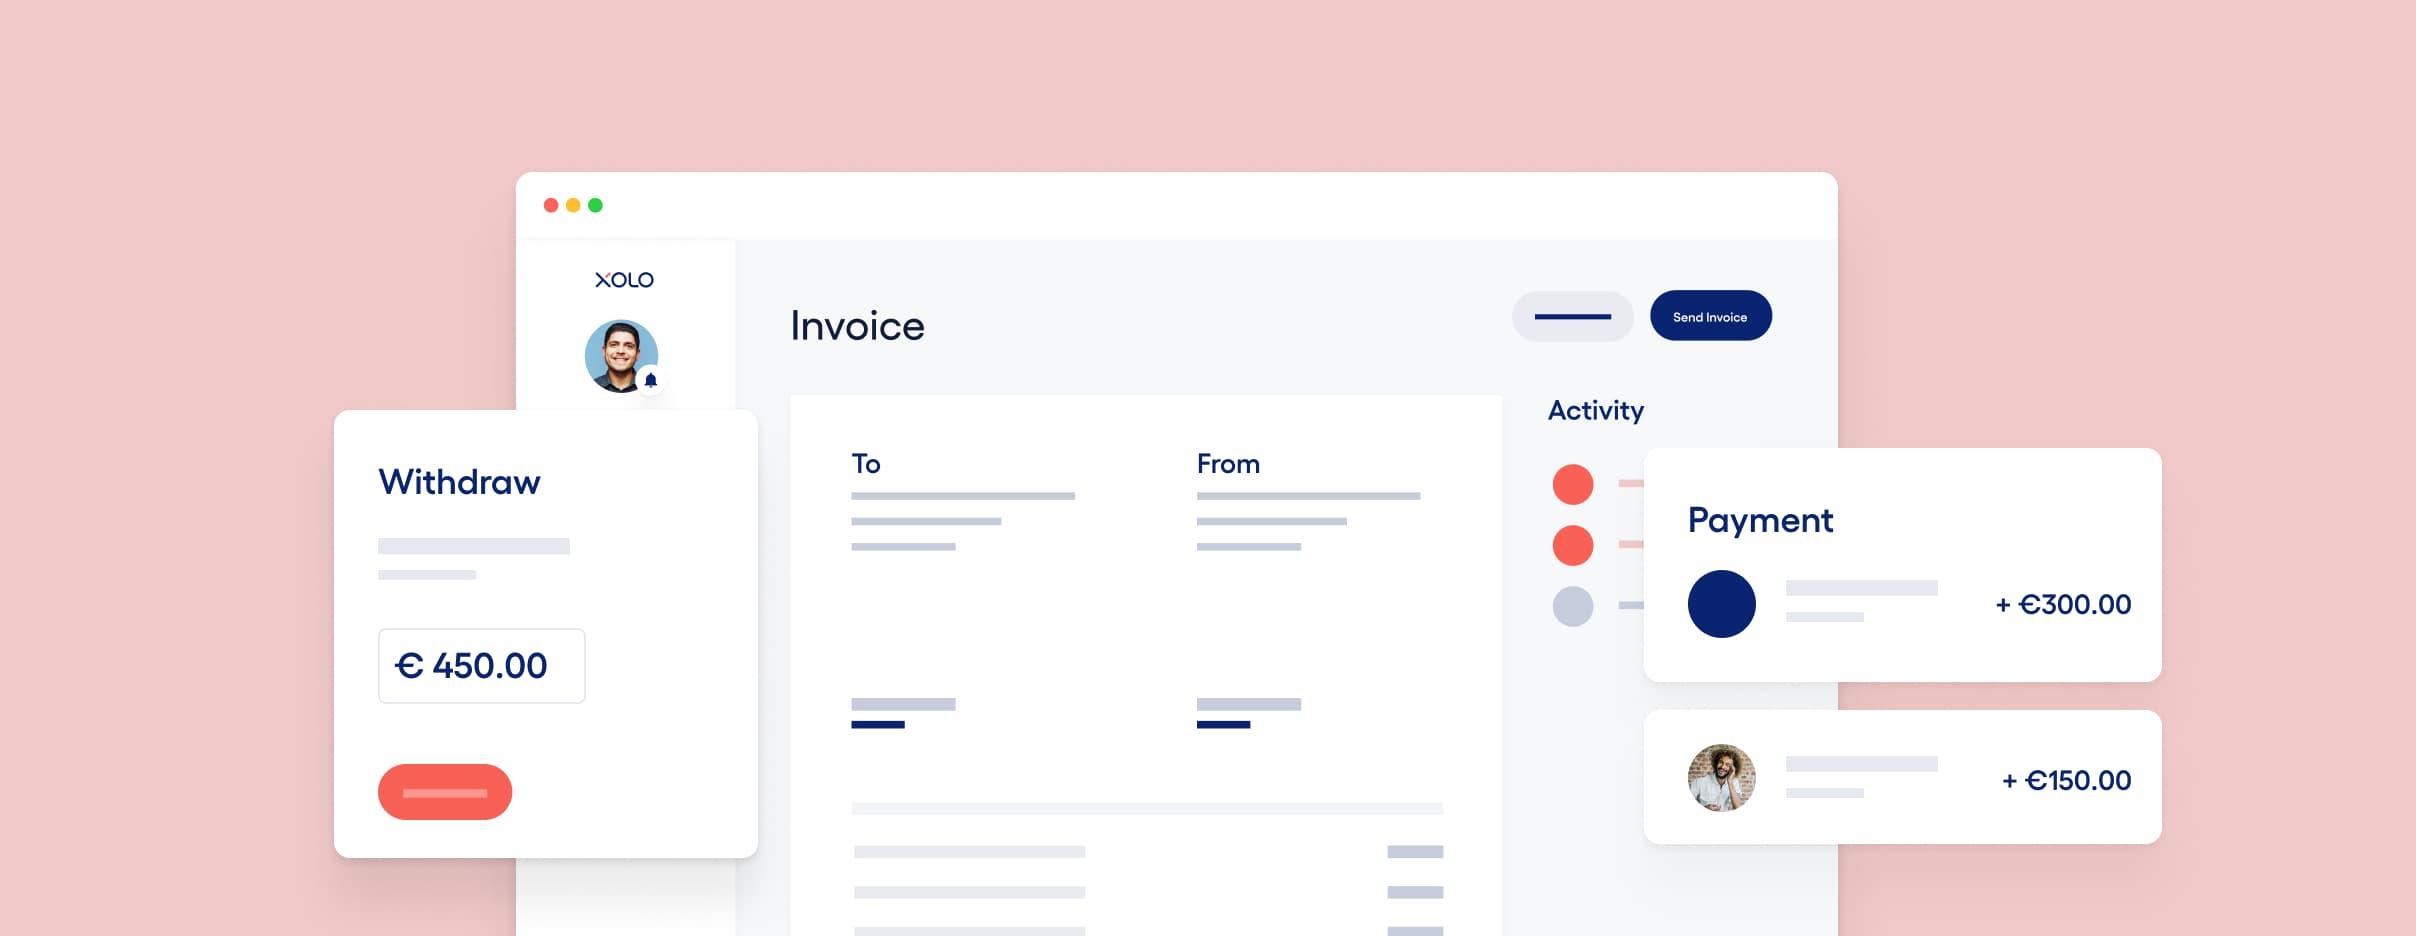 Image of Xolo's invoice